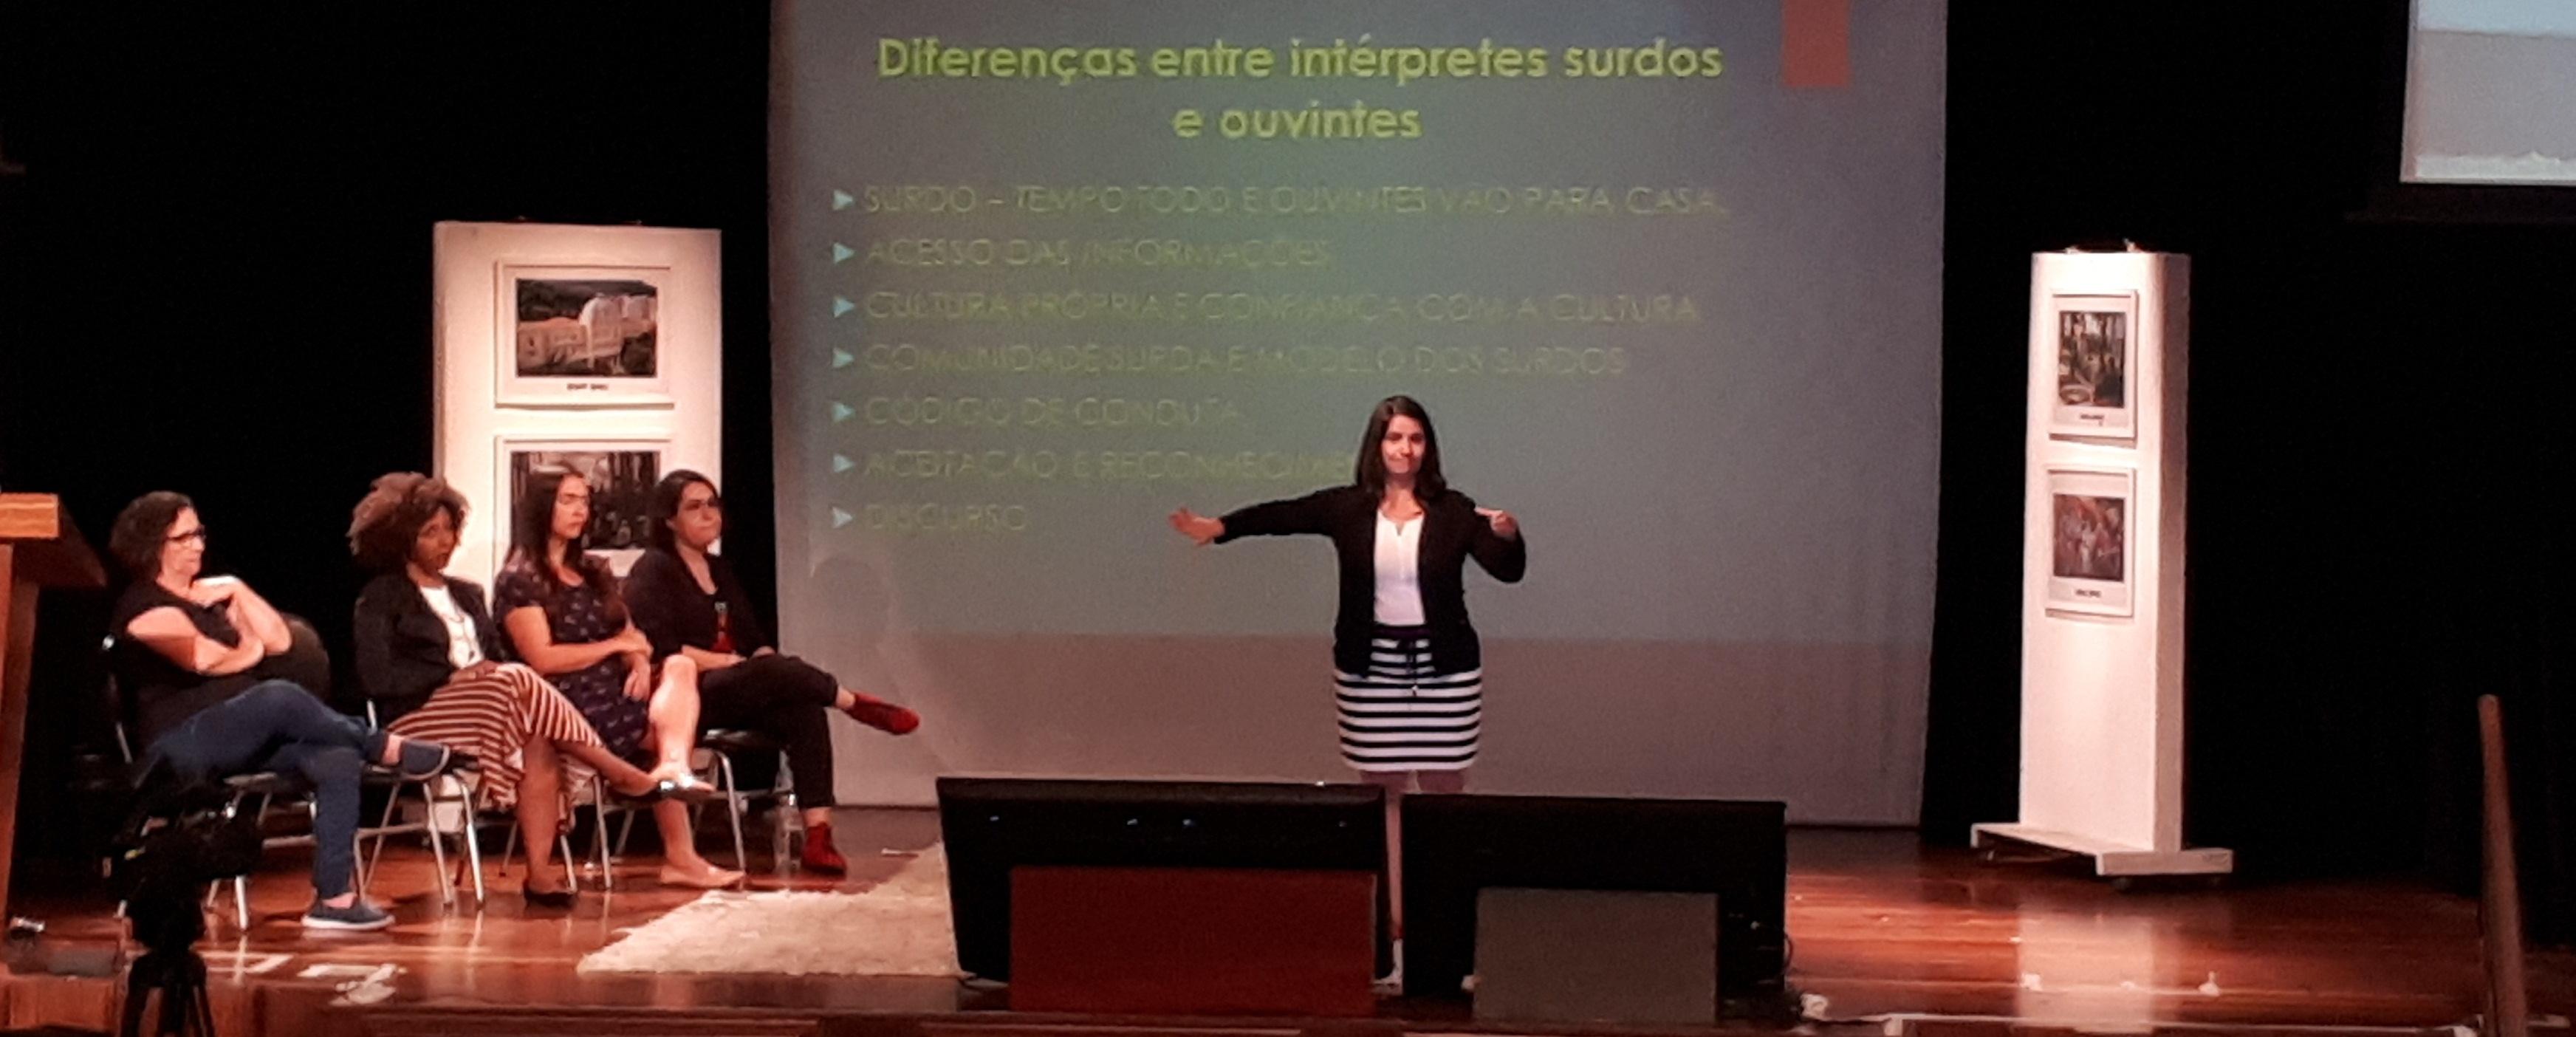 INES realiza I Seminário de Tradutores, Intérpretes e Guia-intérpretes